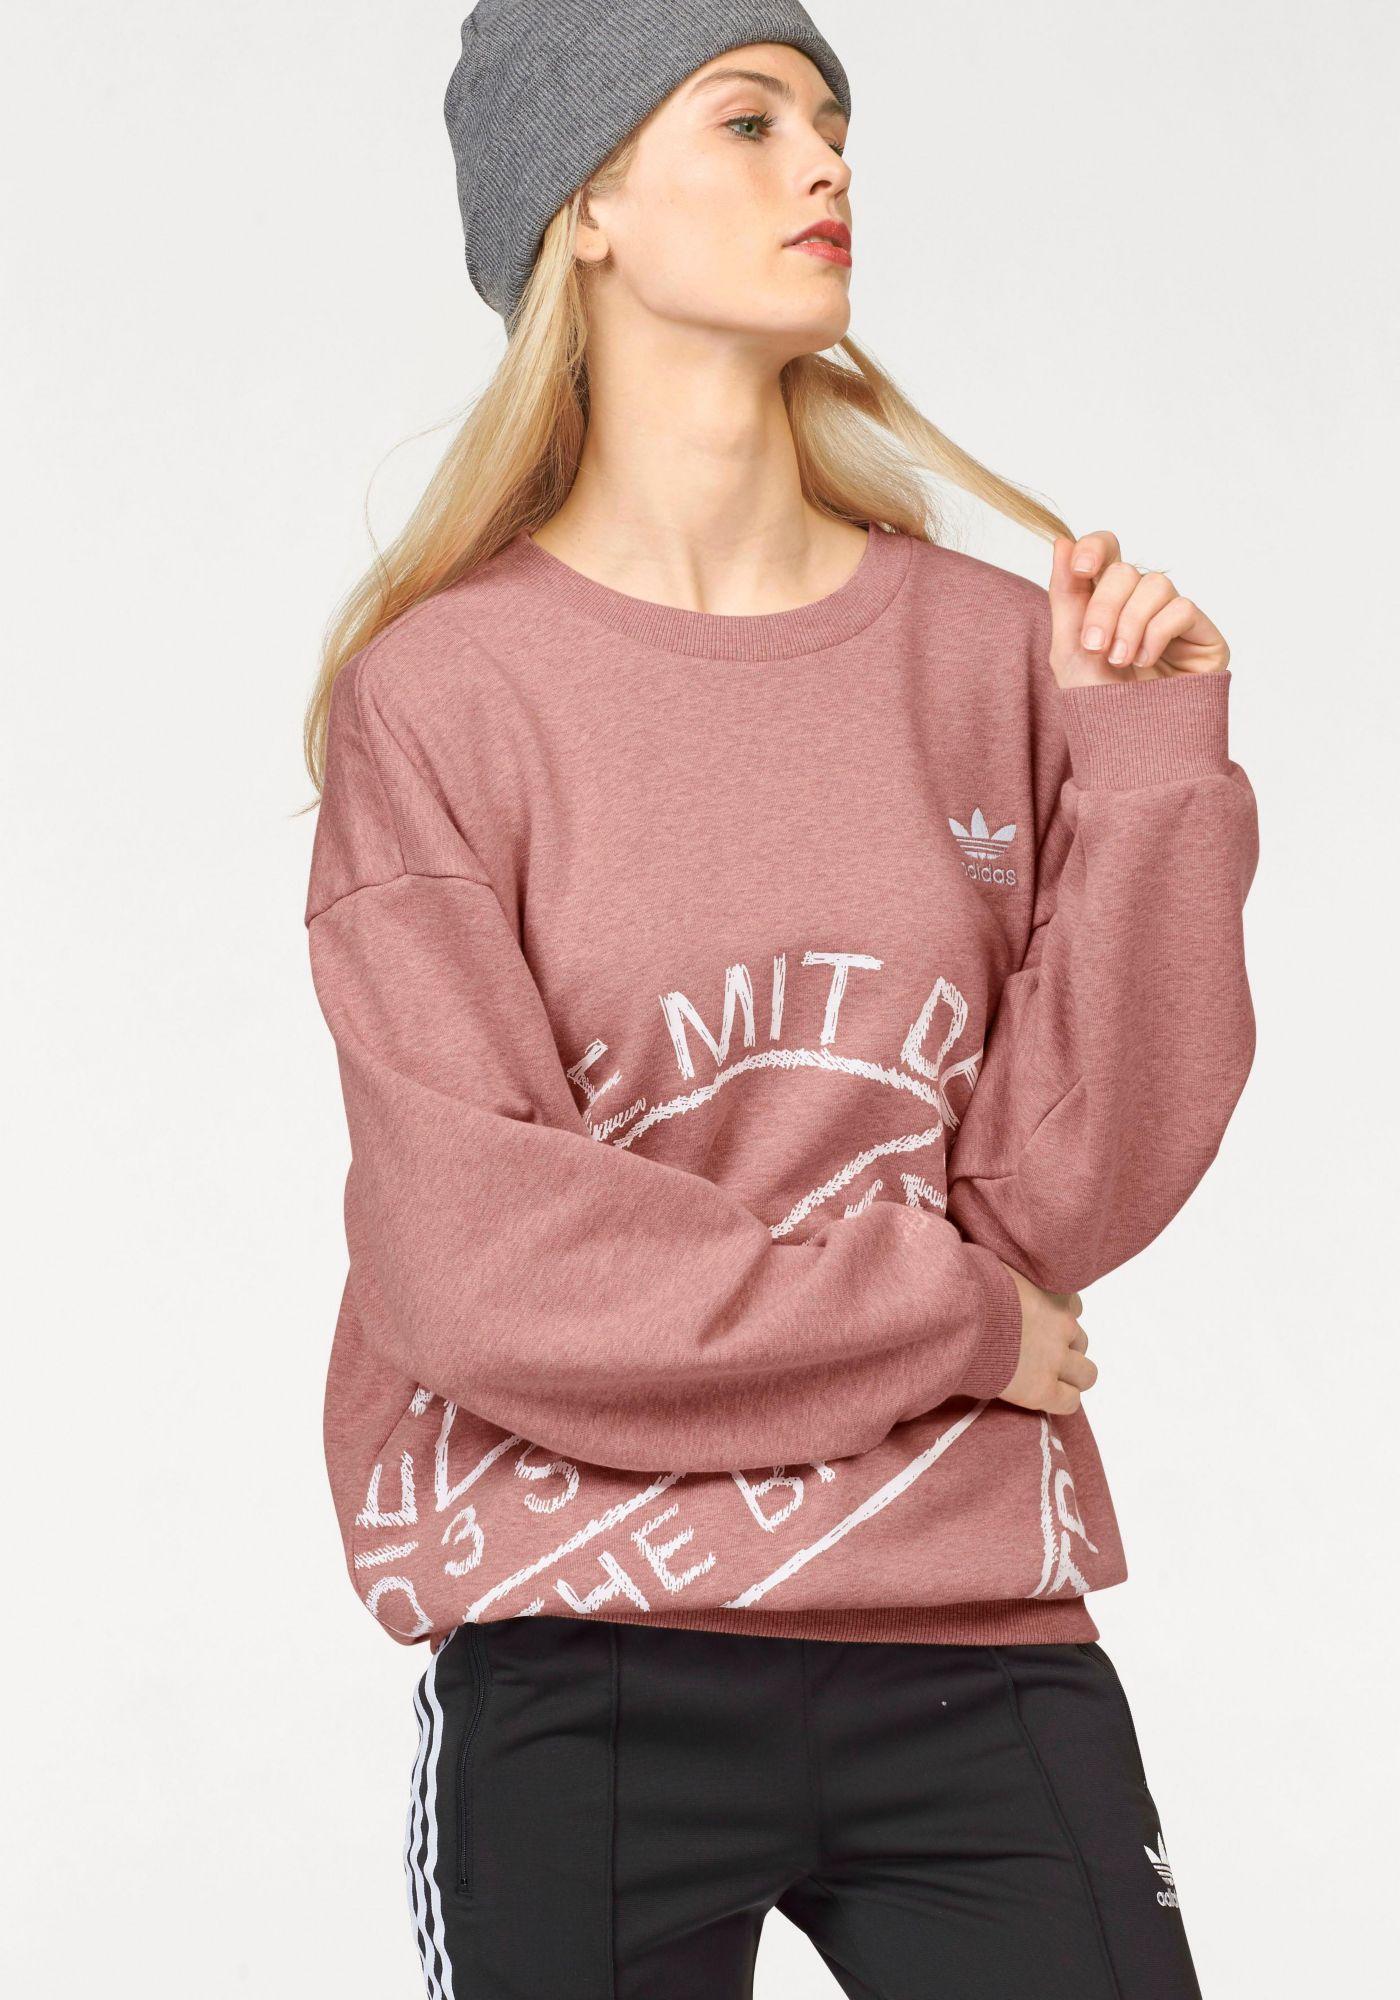 ADIDAS ORIGINALS adidas Originals Sweatshirt »CREW SWEATSHIRT«